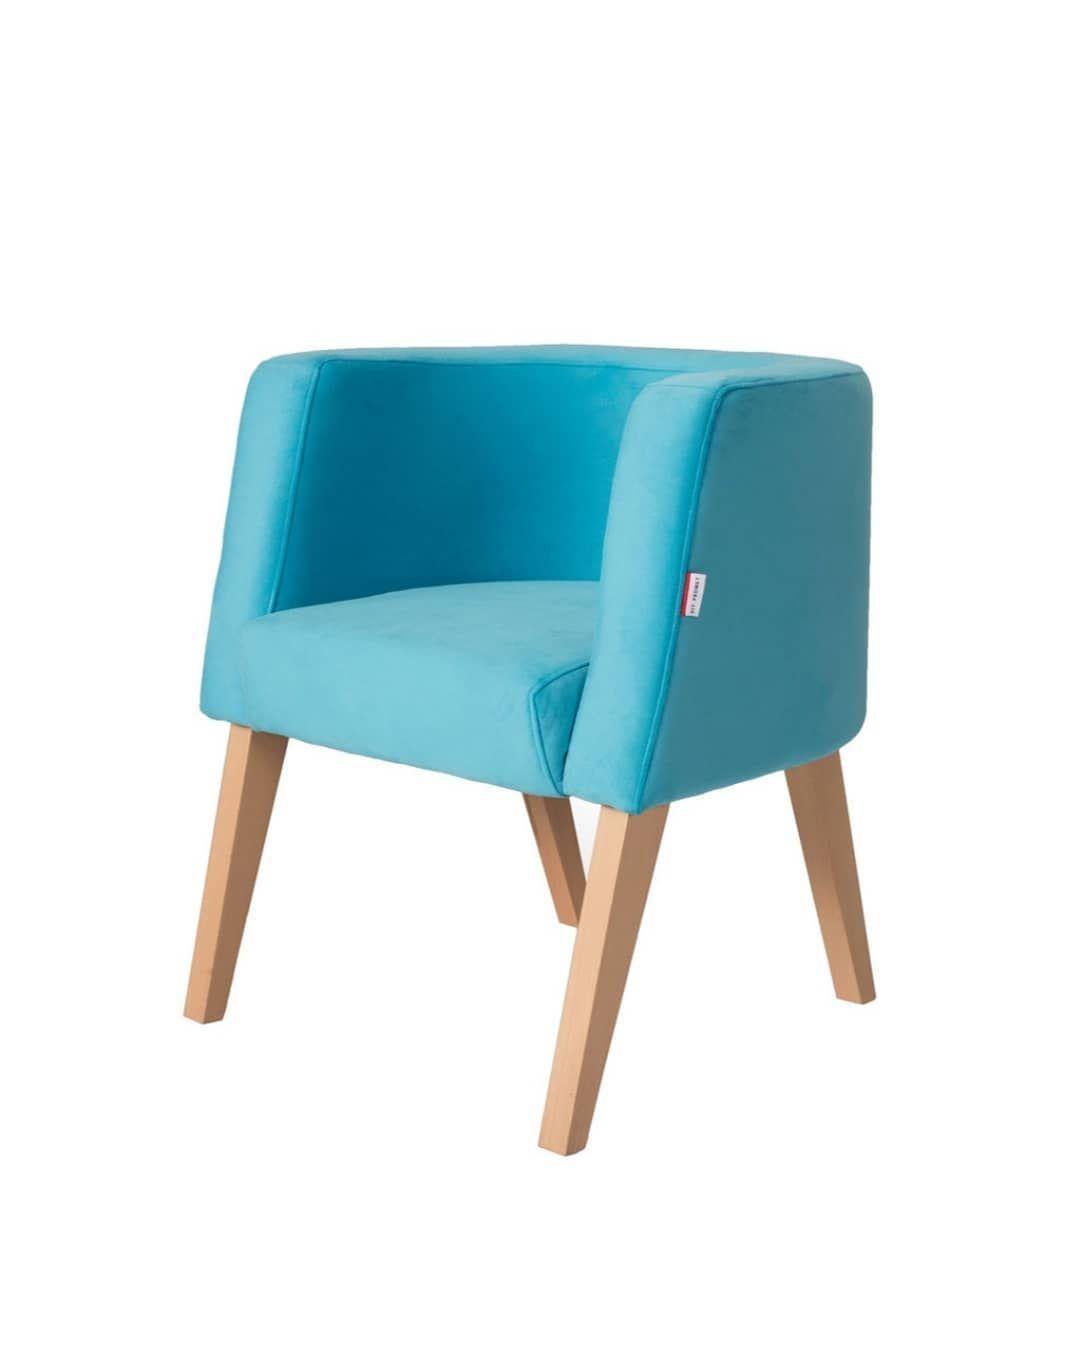 "DIT PROMET on Instagram: ""#ditpromet #belgradecompany #beta #stolicabeta #betachair #furniture #furnitureproducer #furnituredesign #design #scandinaviandesign…"""